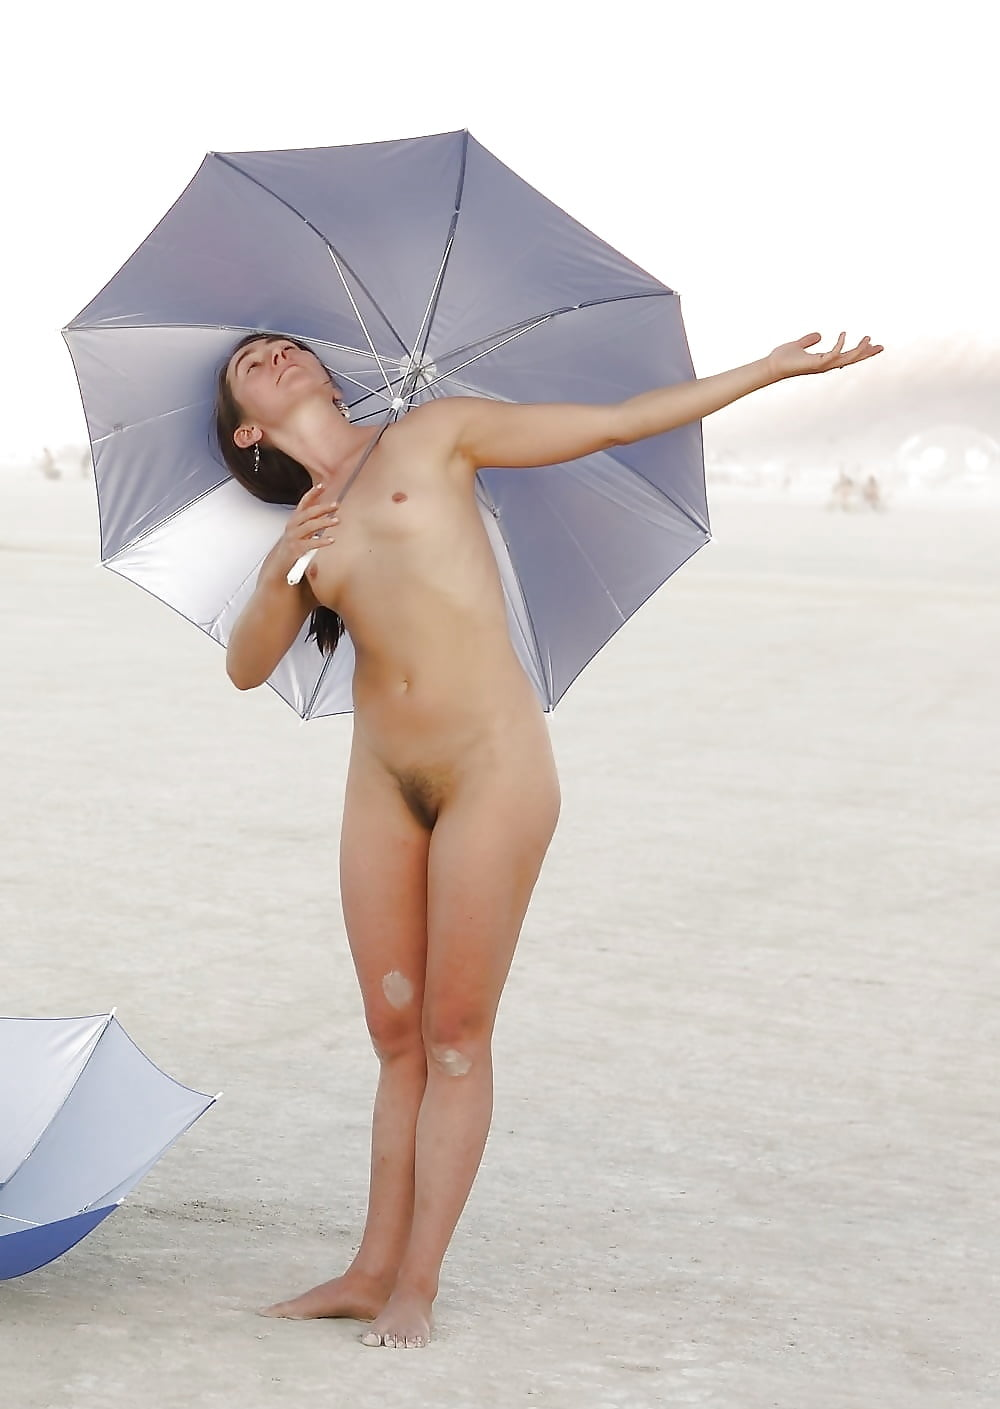 Indian sexy models, nude college girls, nude hot girls, desi girls